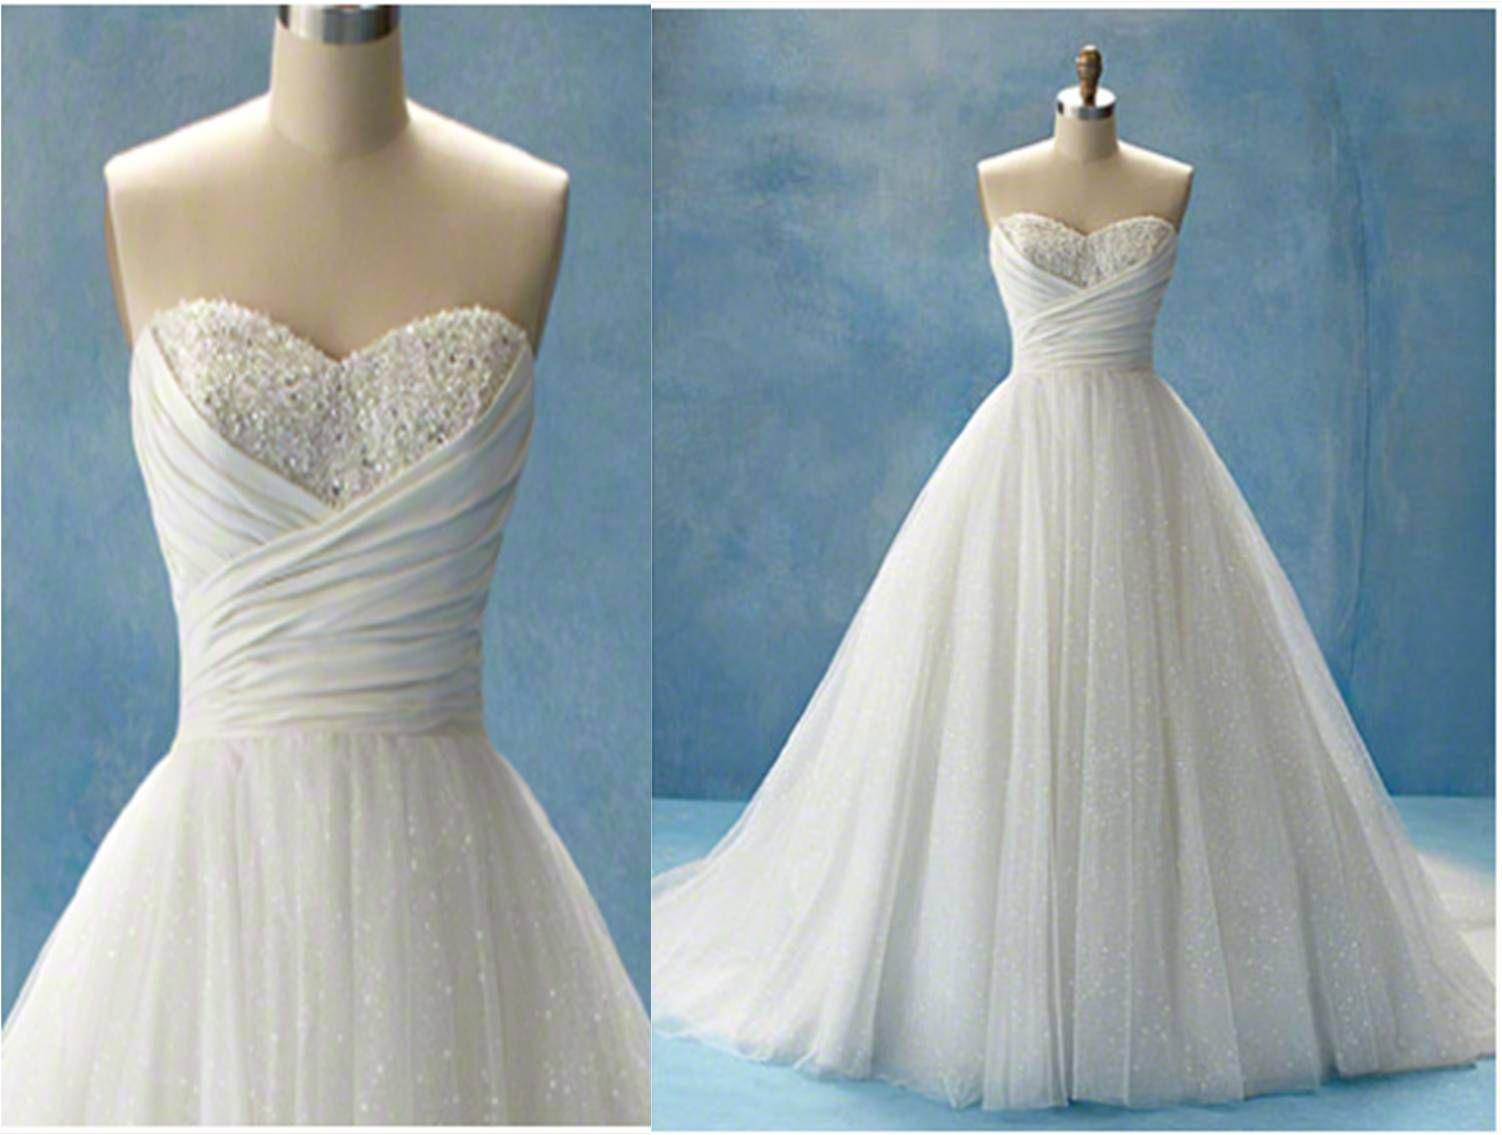 White Poofy Prom Dresses Dresses Glitter Ball Gown